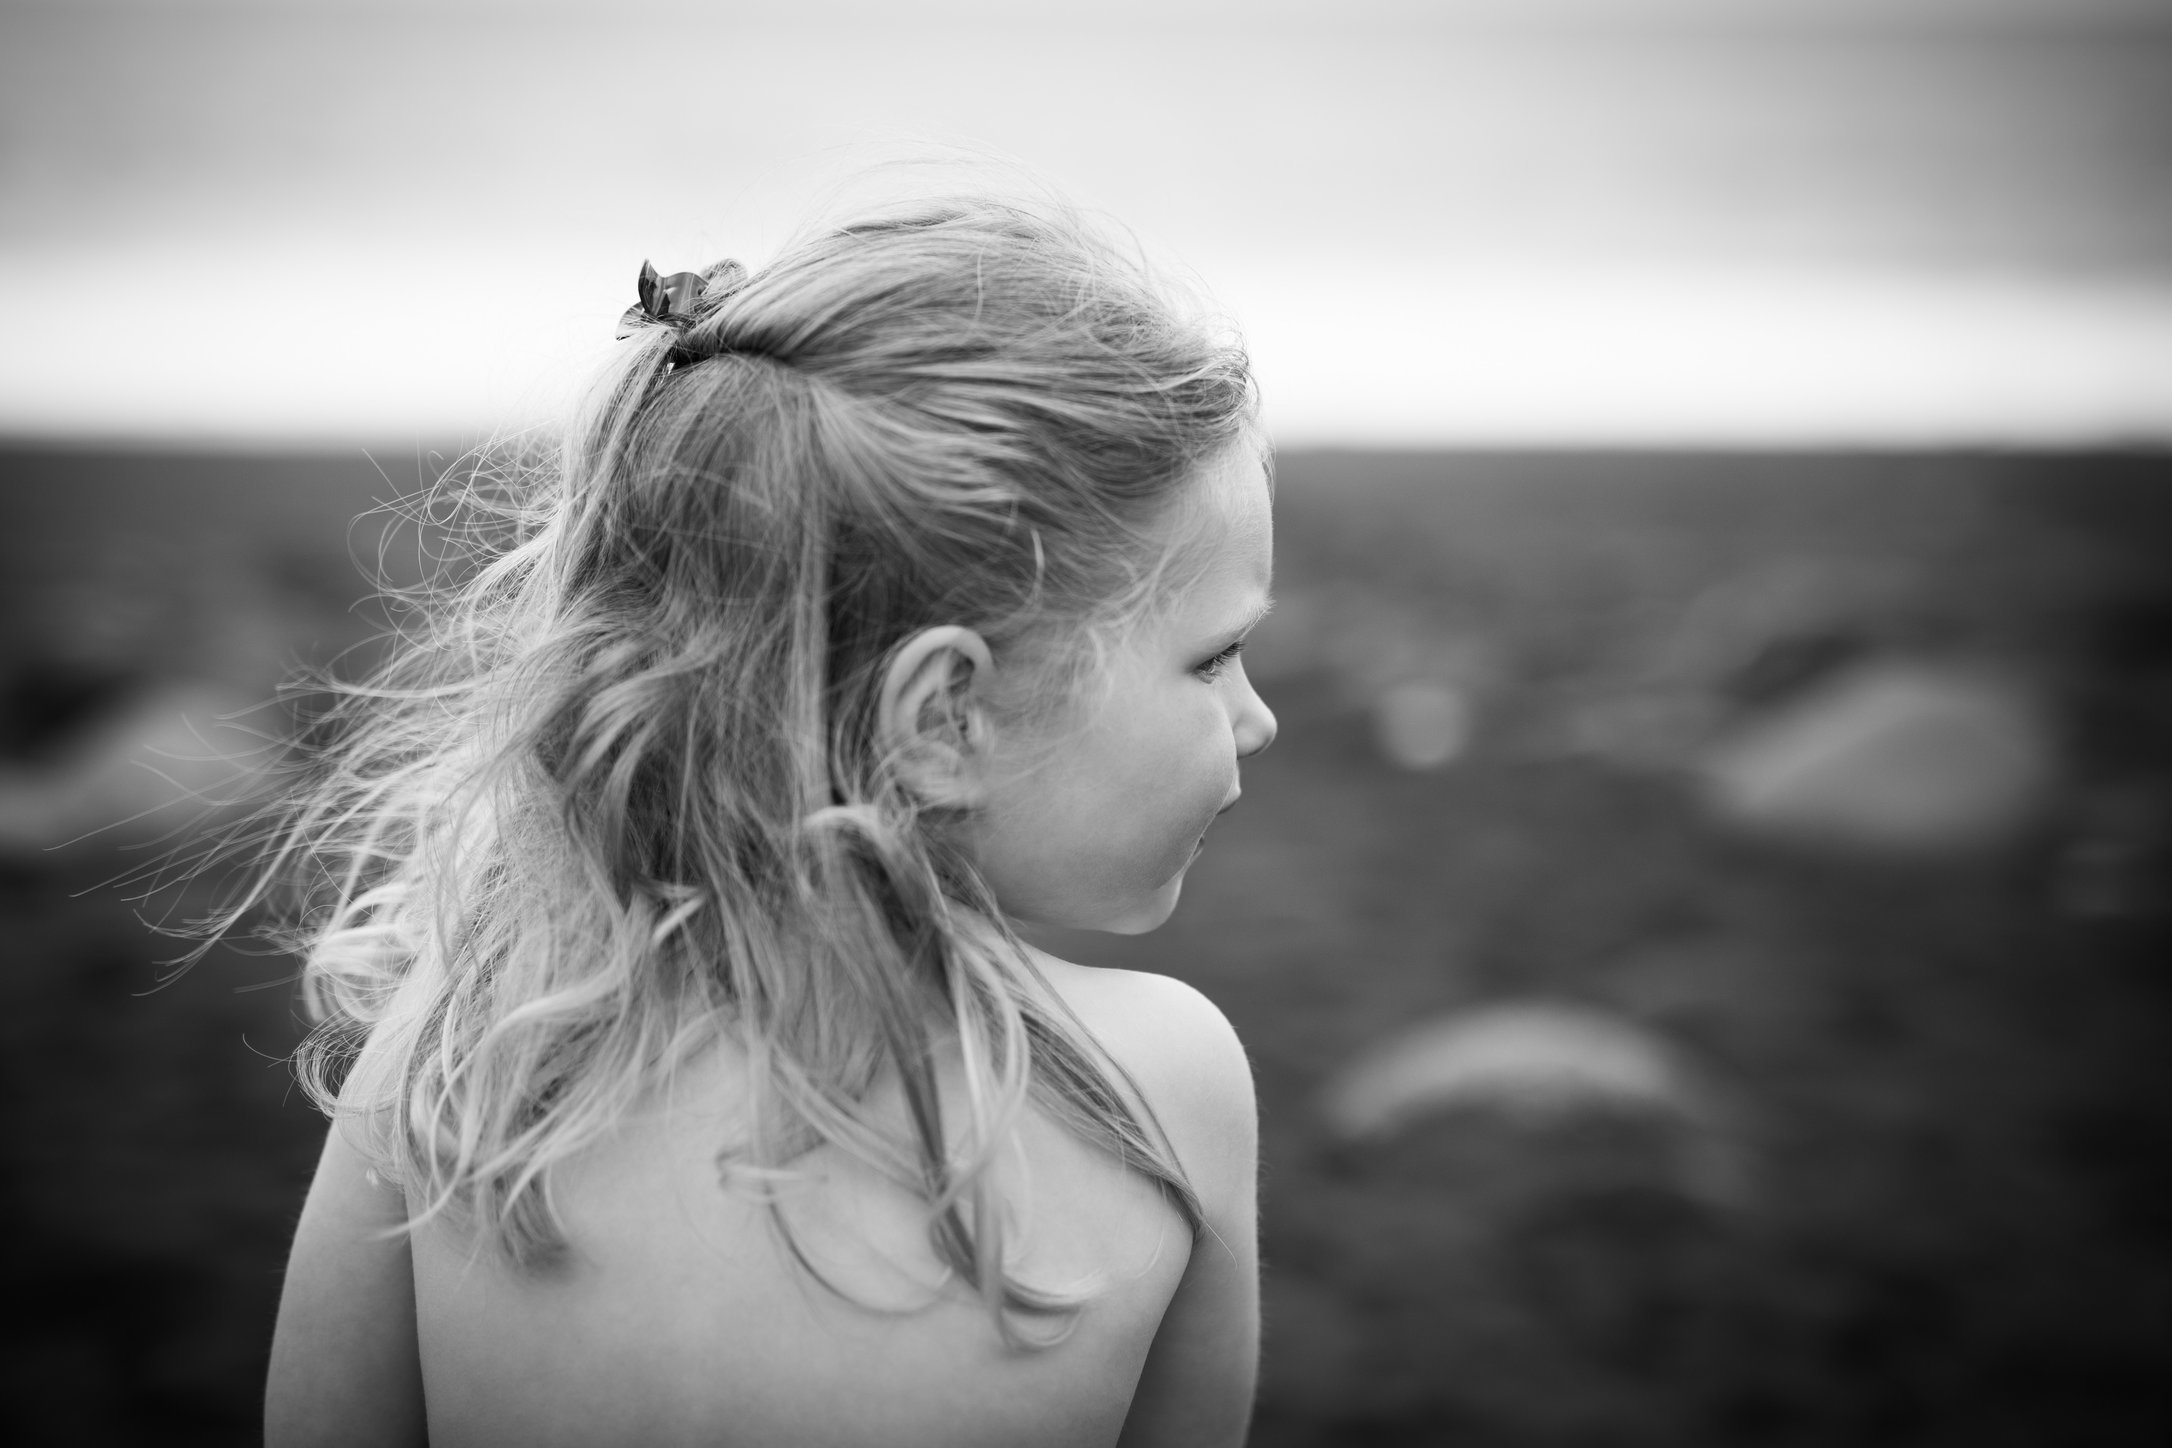 Portretfoto_kind_op_lavastrand_opzij_kijkend.jpg